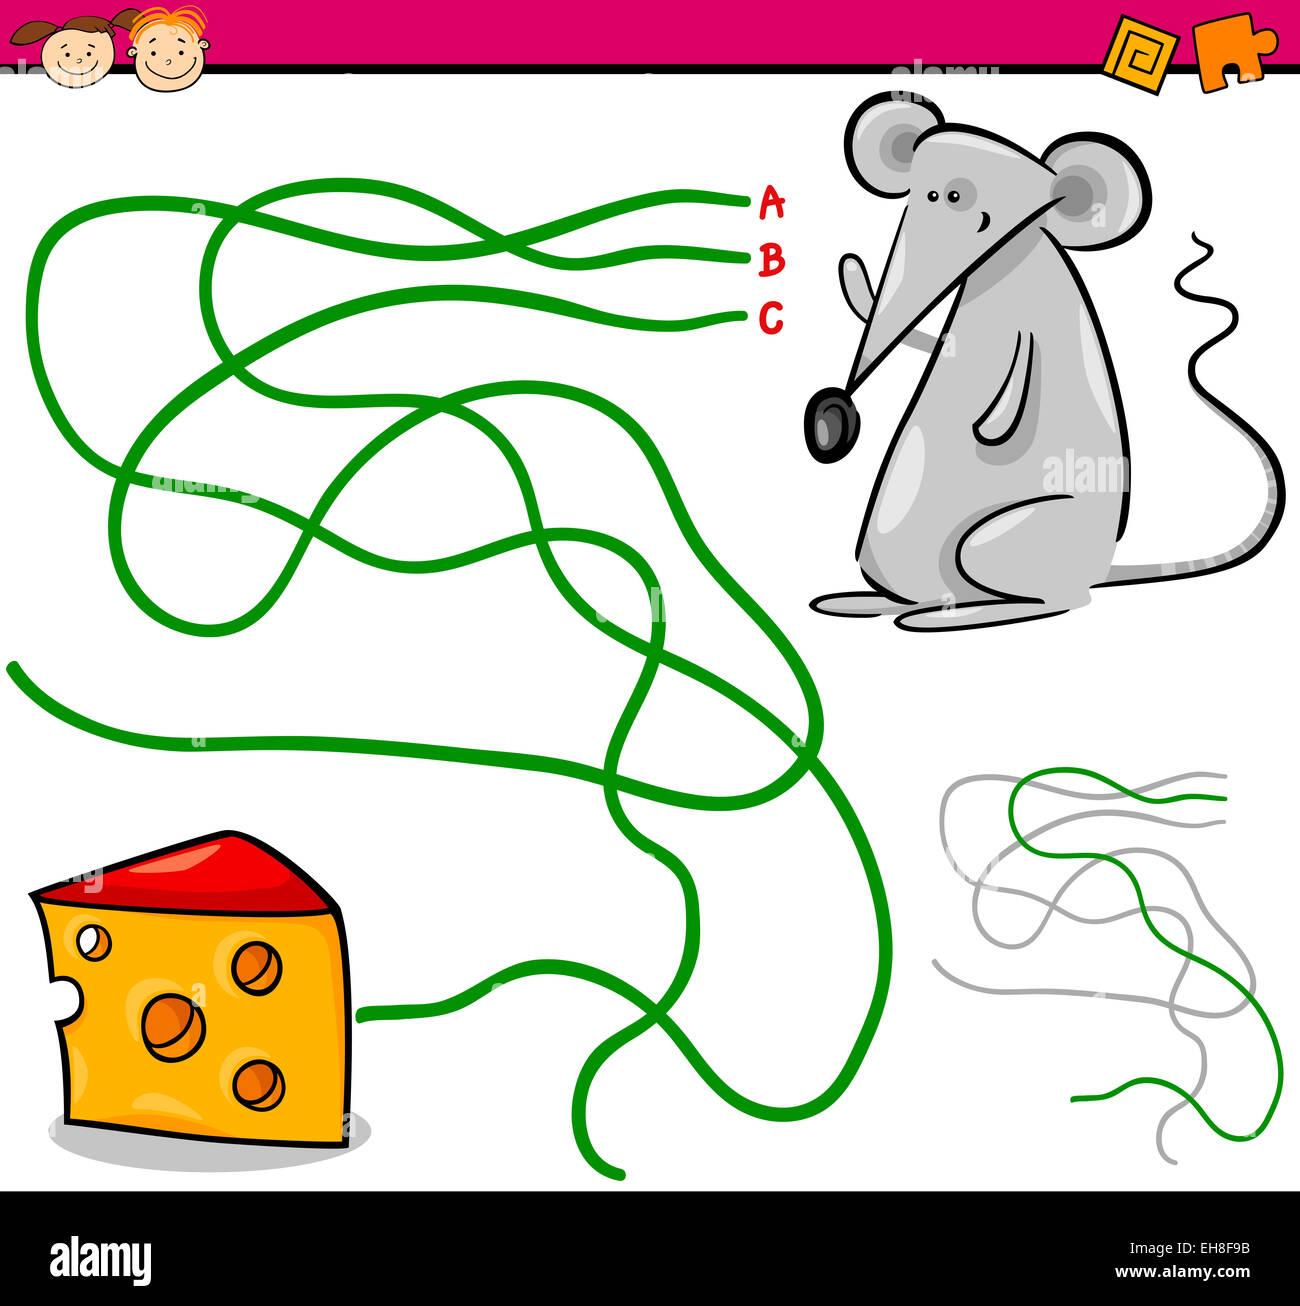 Cartoon Illustration of Education Path or Maze Game for Preschool ...